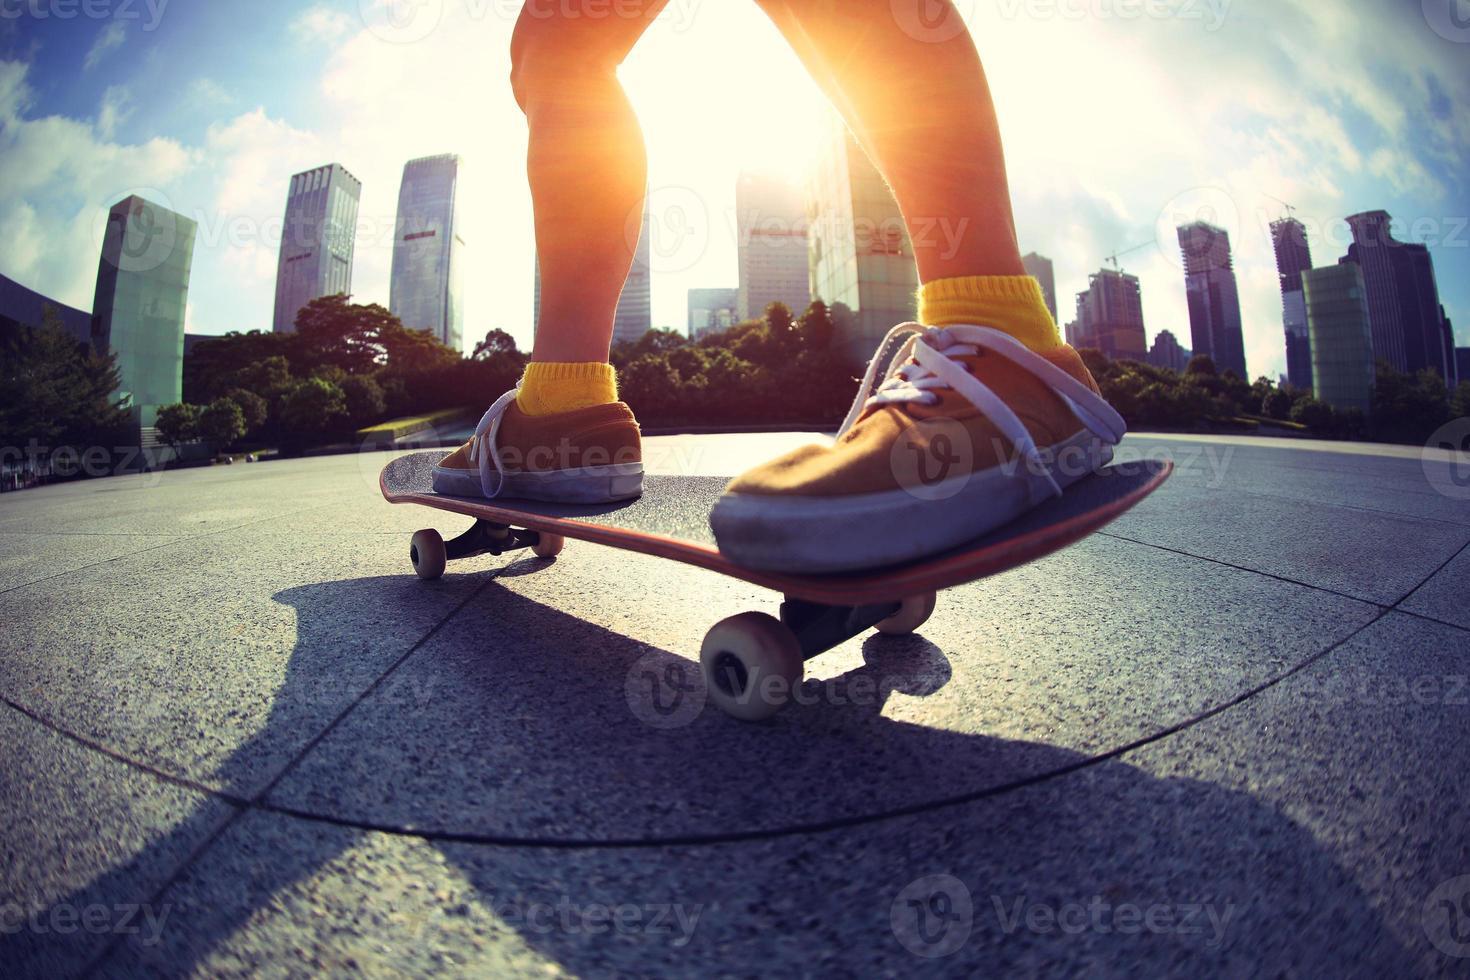 skateboarder skateboarding at sunrise city photo